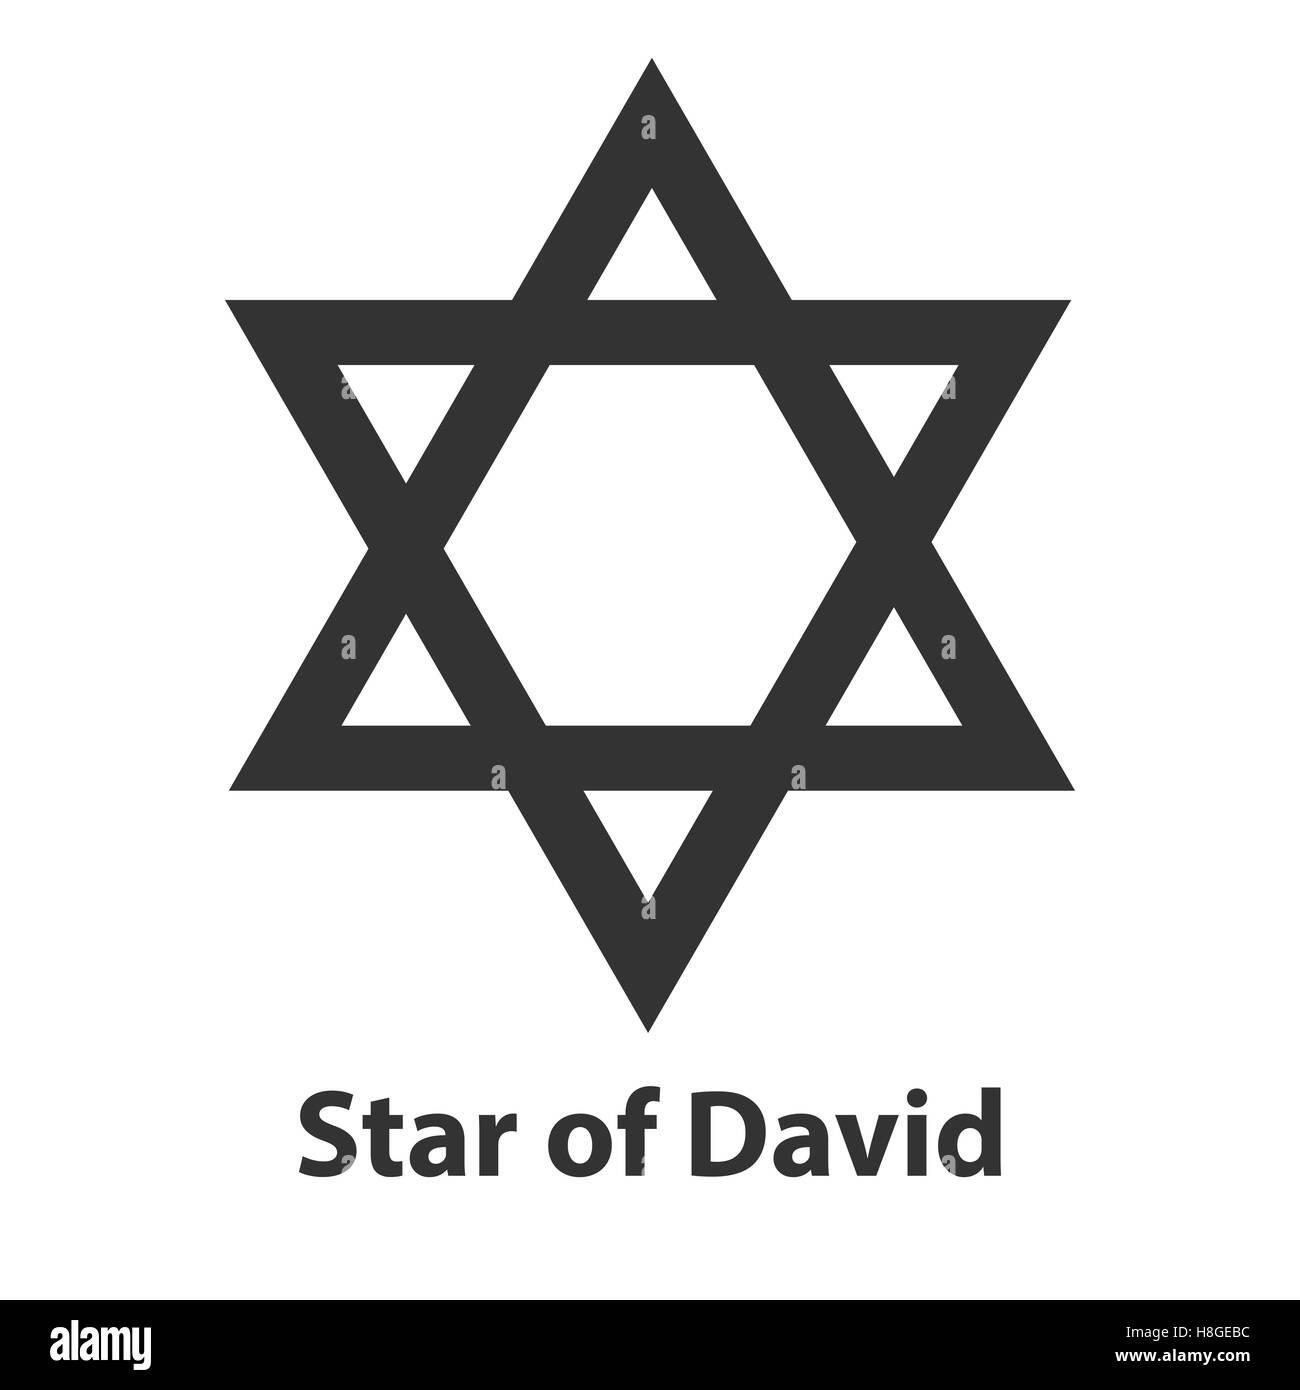 Icon of Star of David symbol. Judaism religion sign - Stock Image